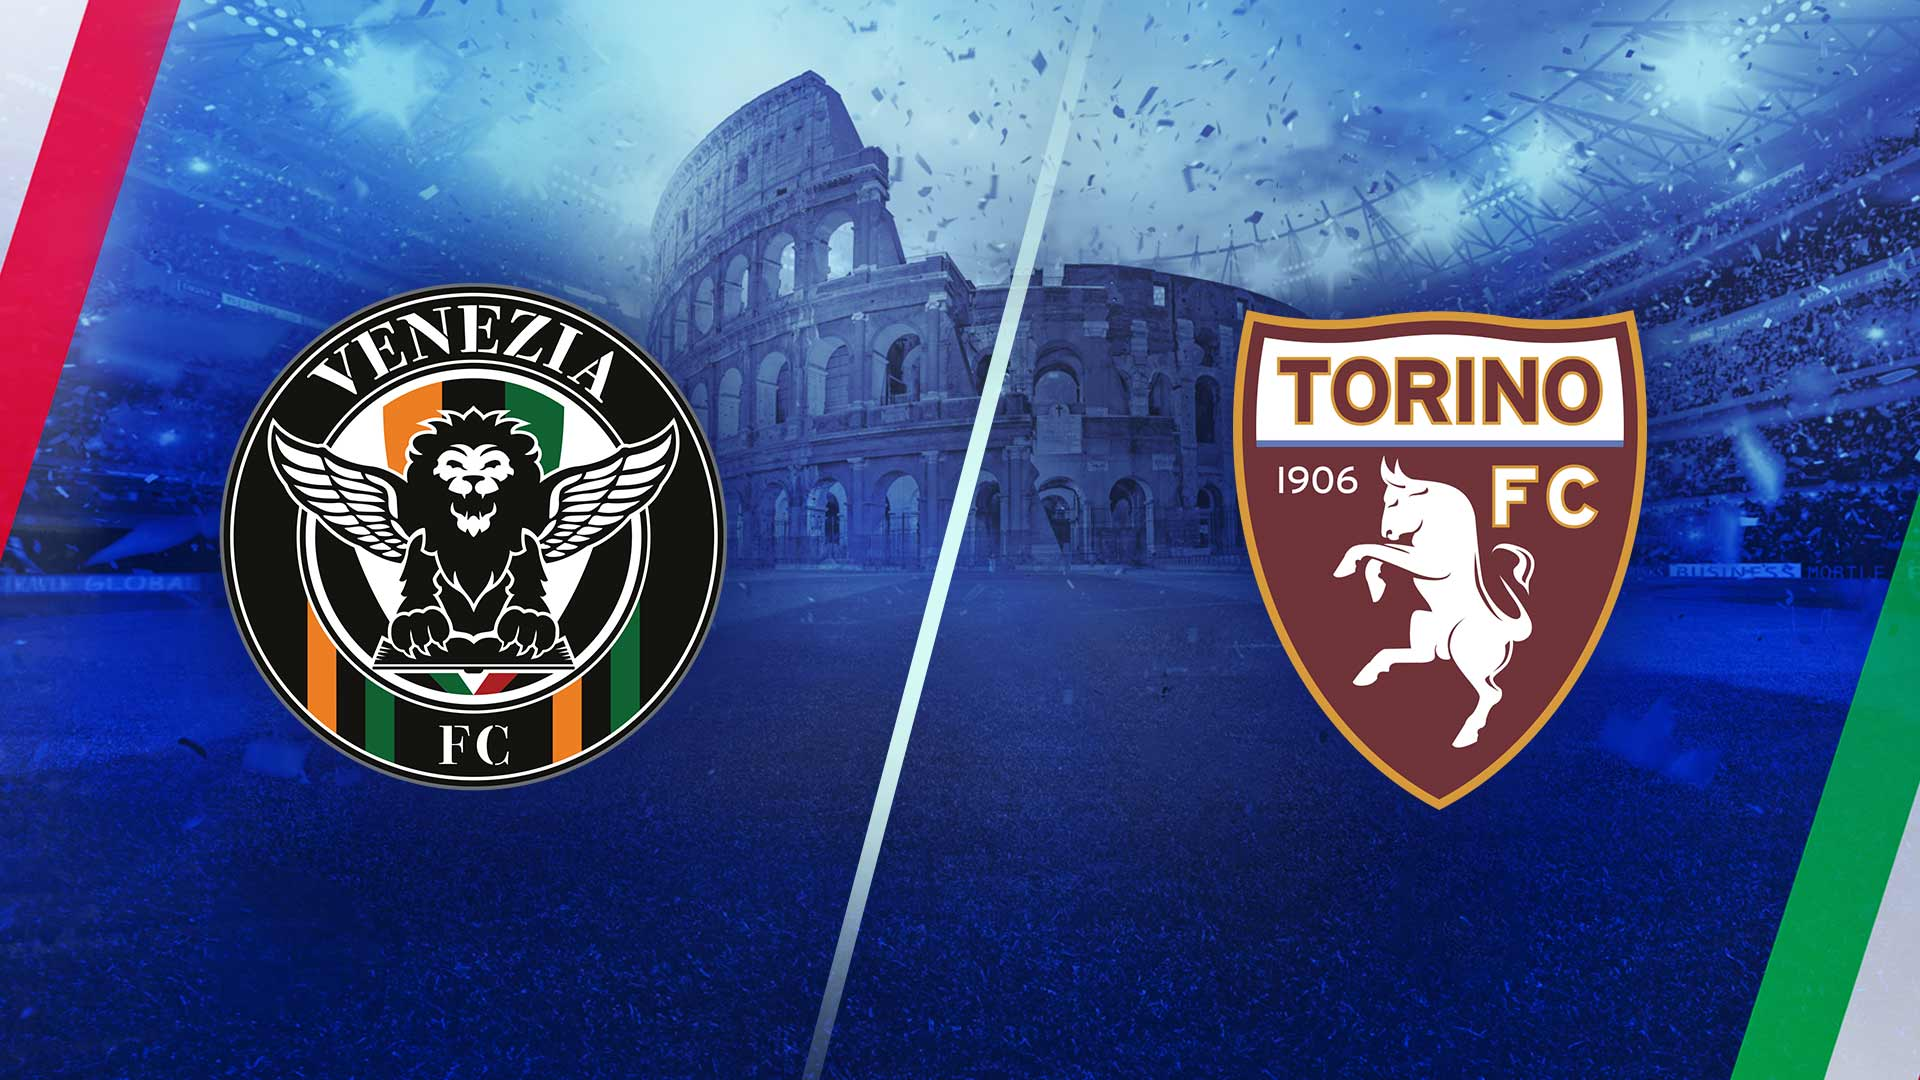 Venezia vs Torino Highlights 27 September 2021